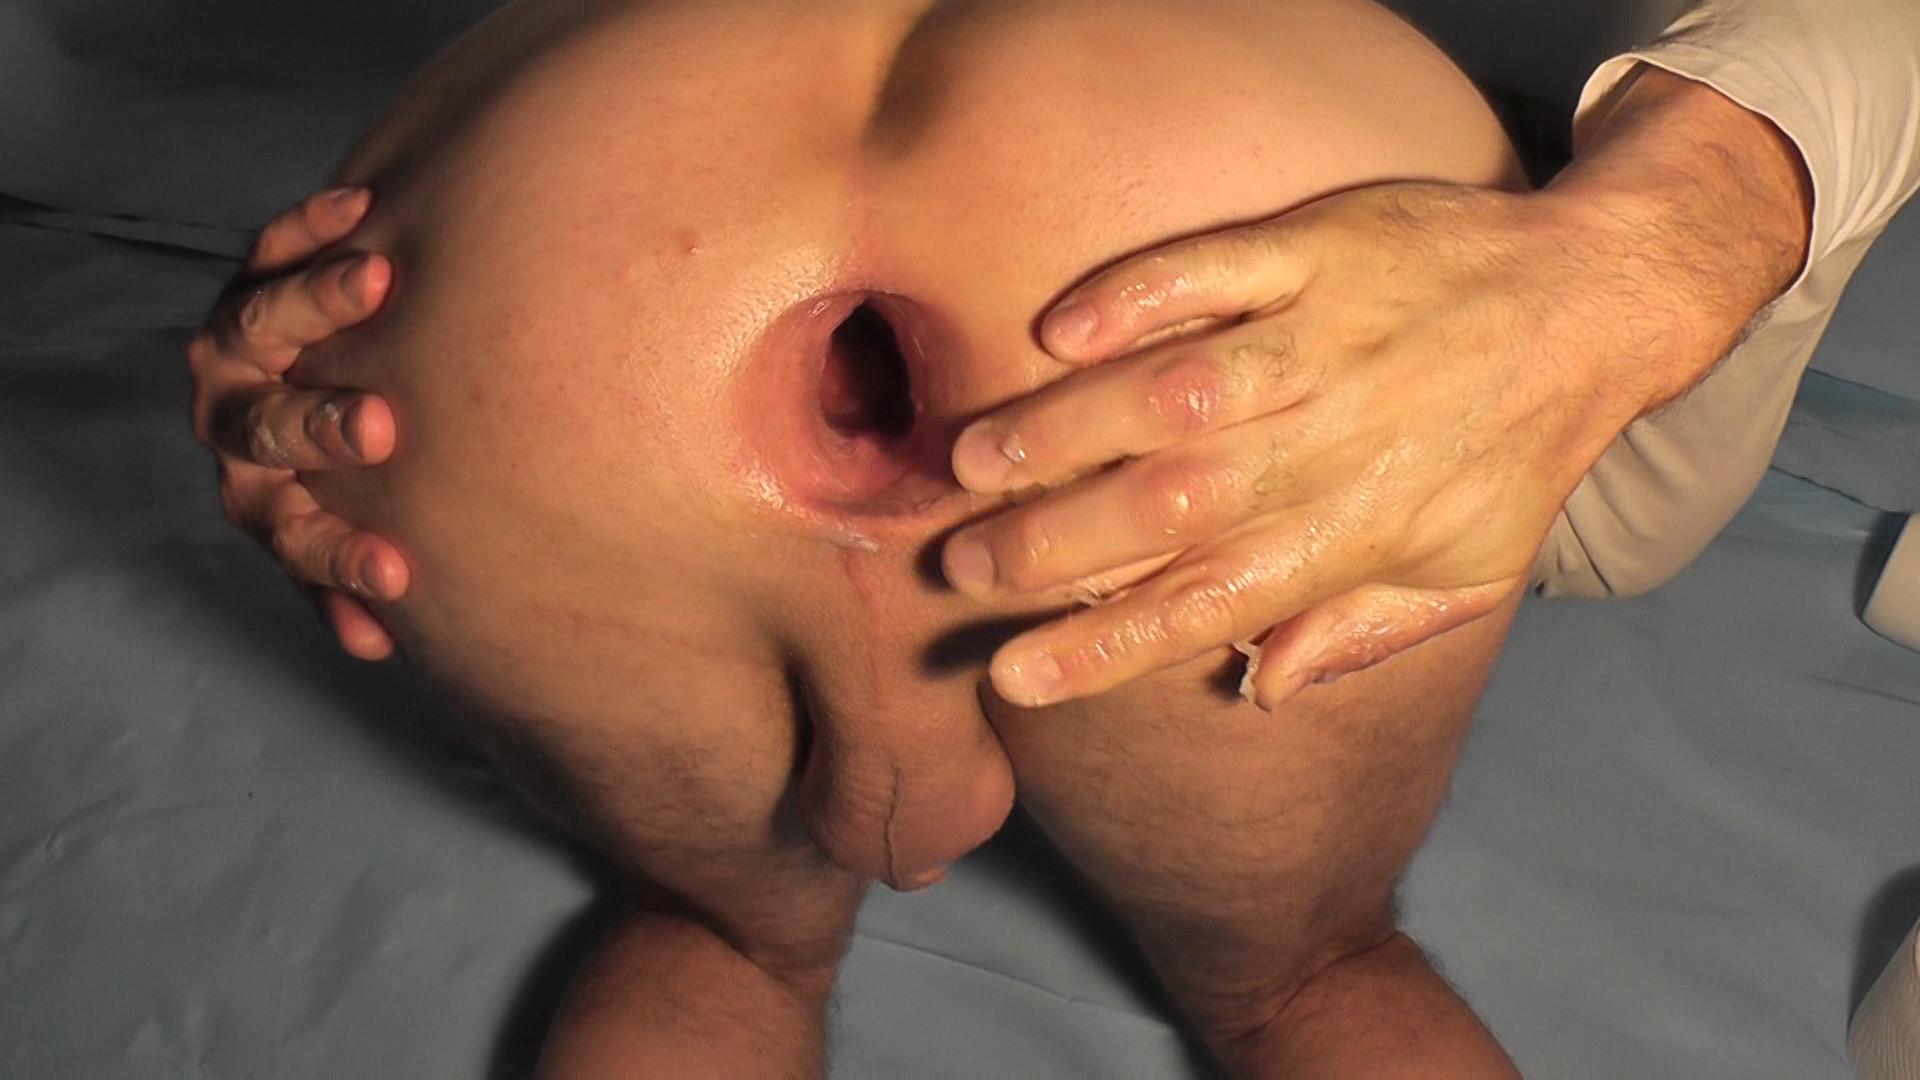 Порно Геи Дыра